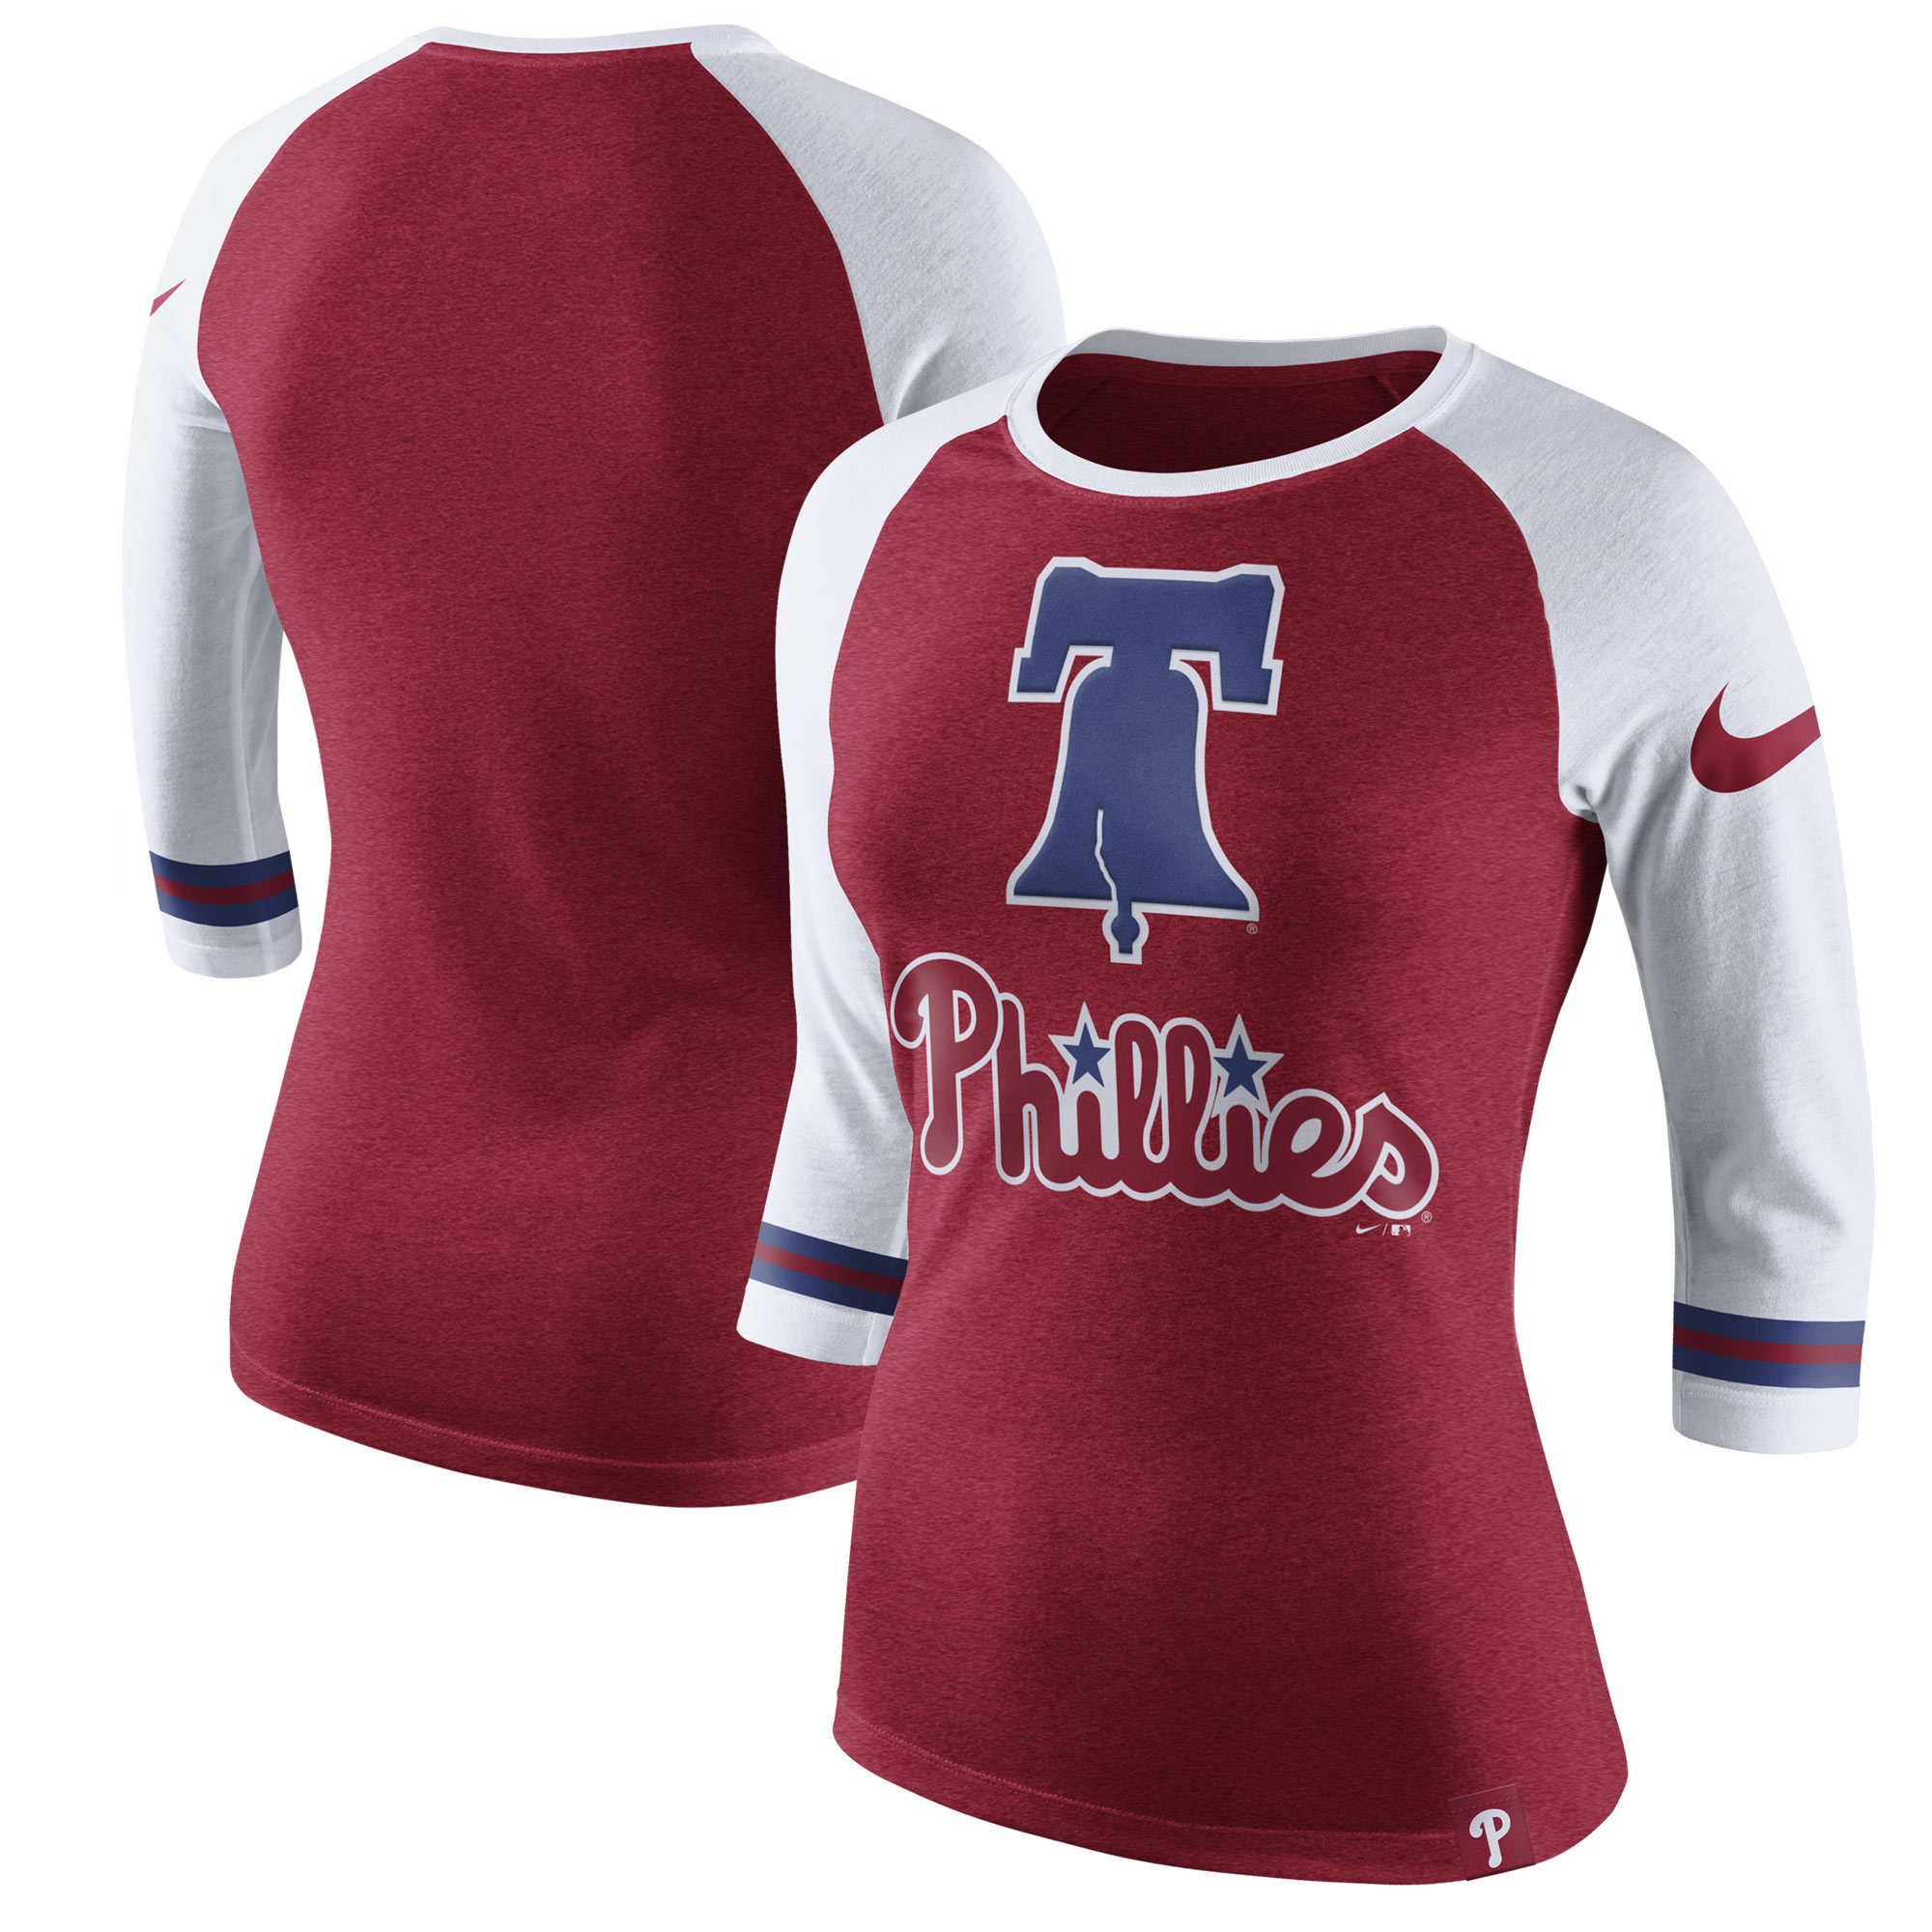 Women's Nike Heathered Red Philadelphia Phillies Tri-Blend 3/4-Sleeve Raglan T-Shirt